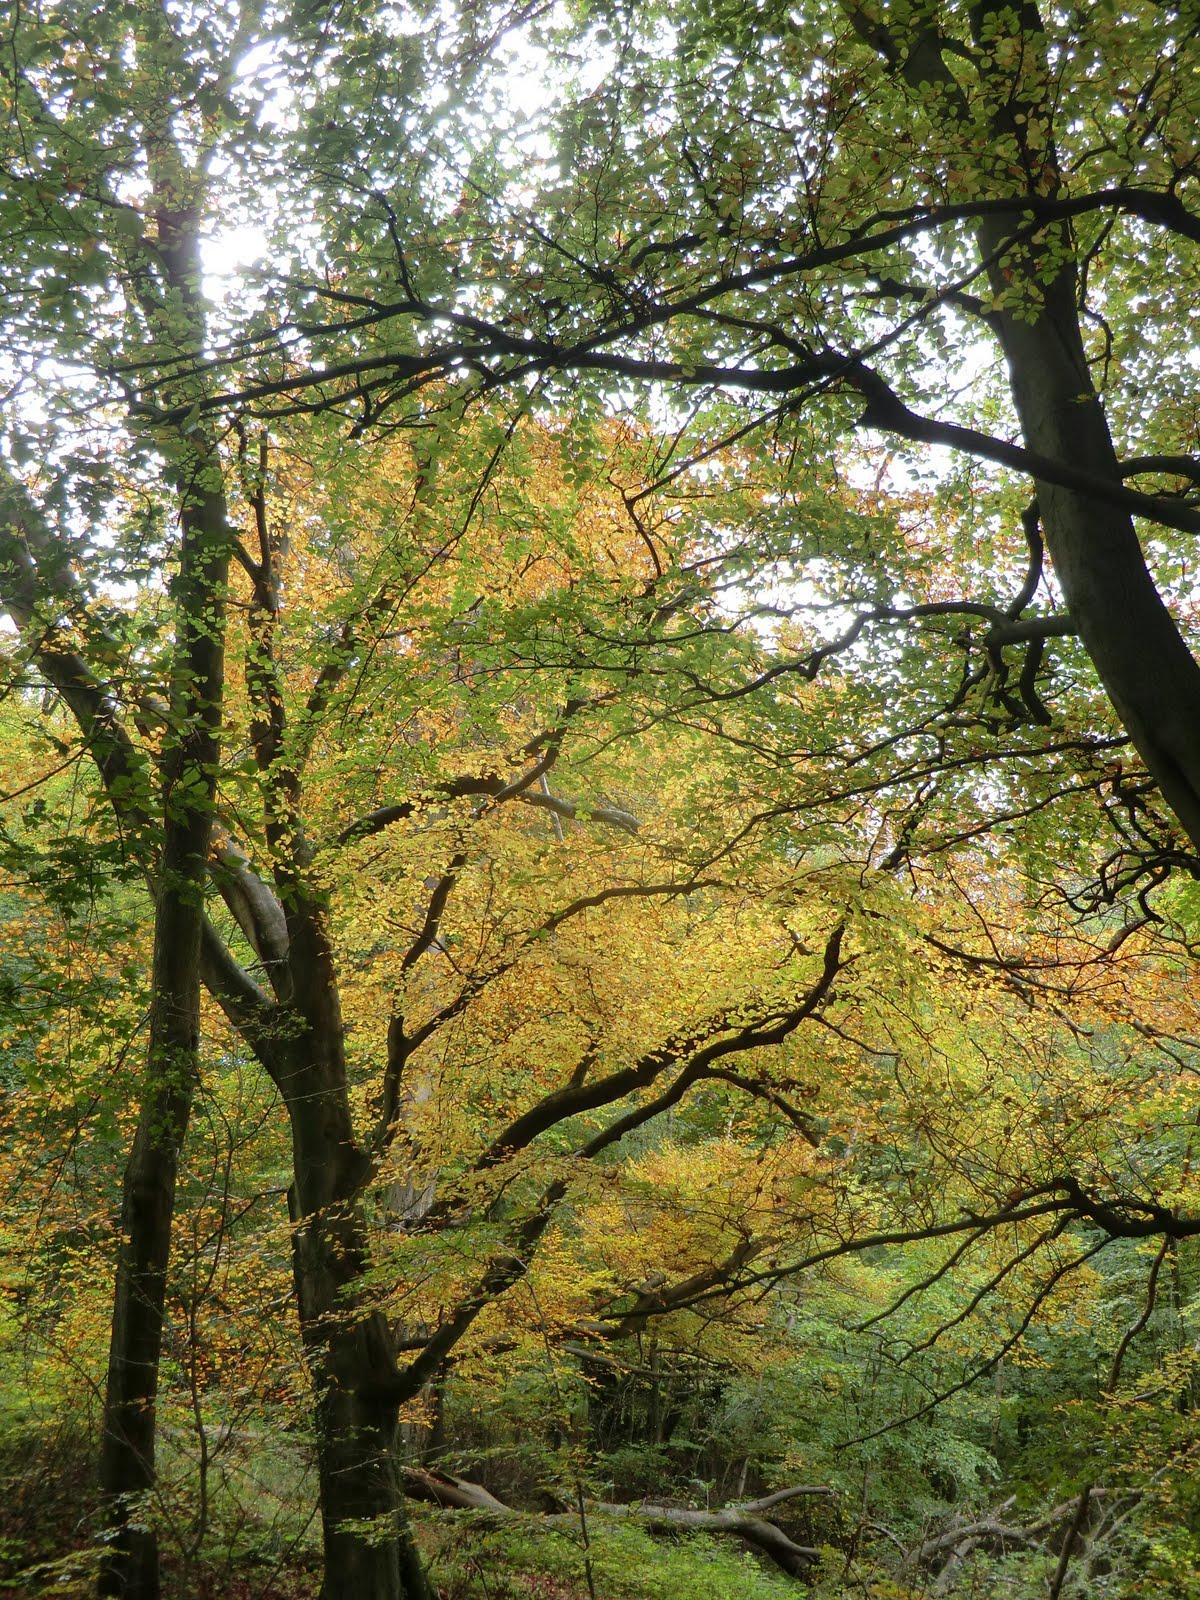 CIMG0898 Marden Park Woods in autumn